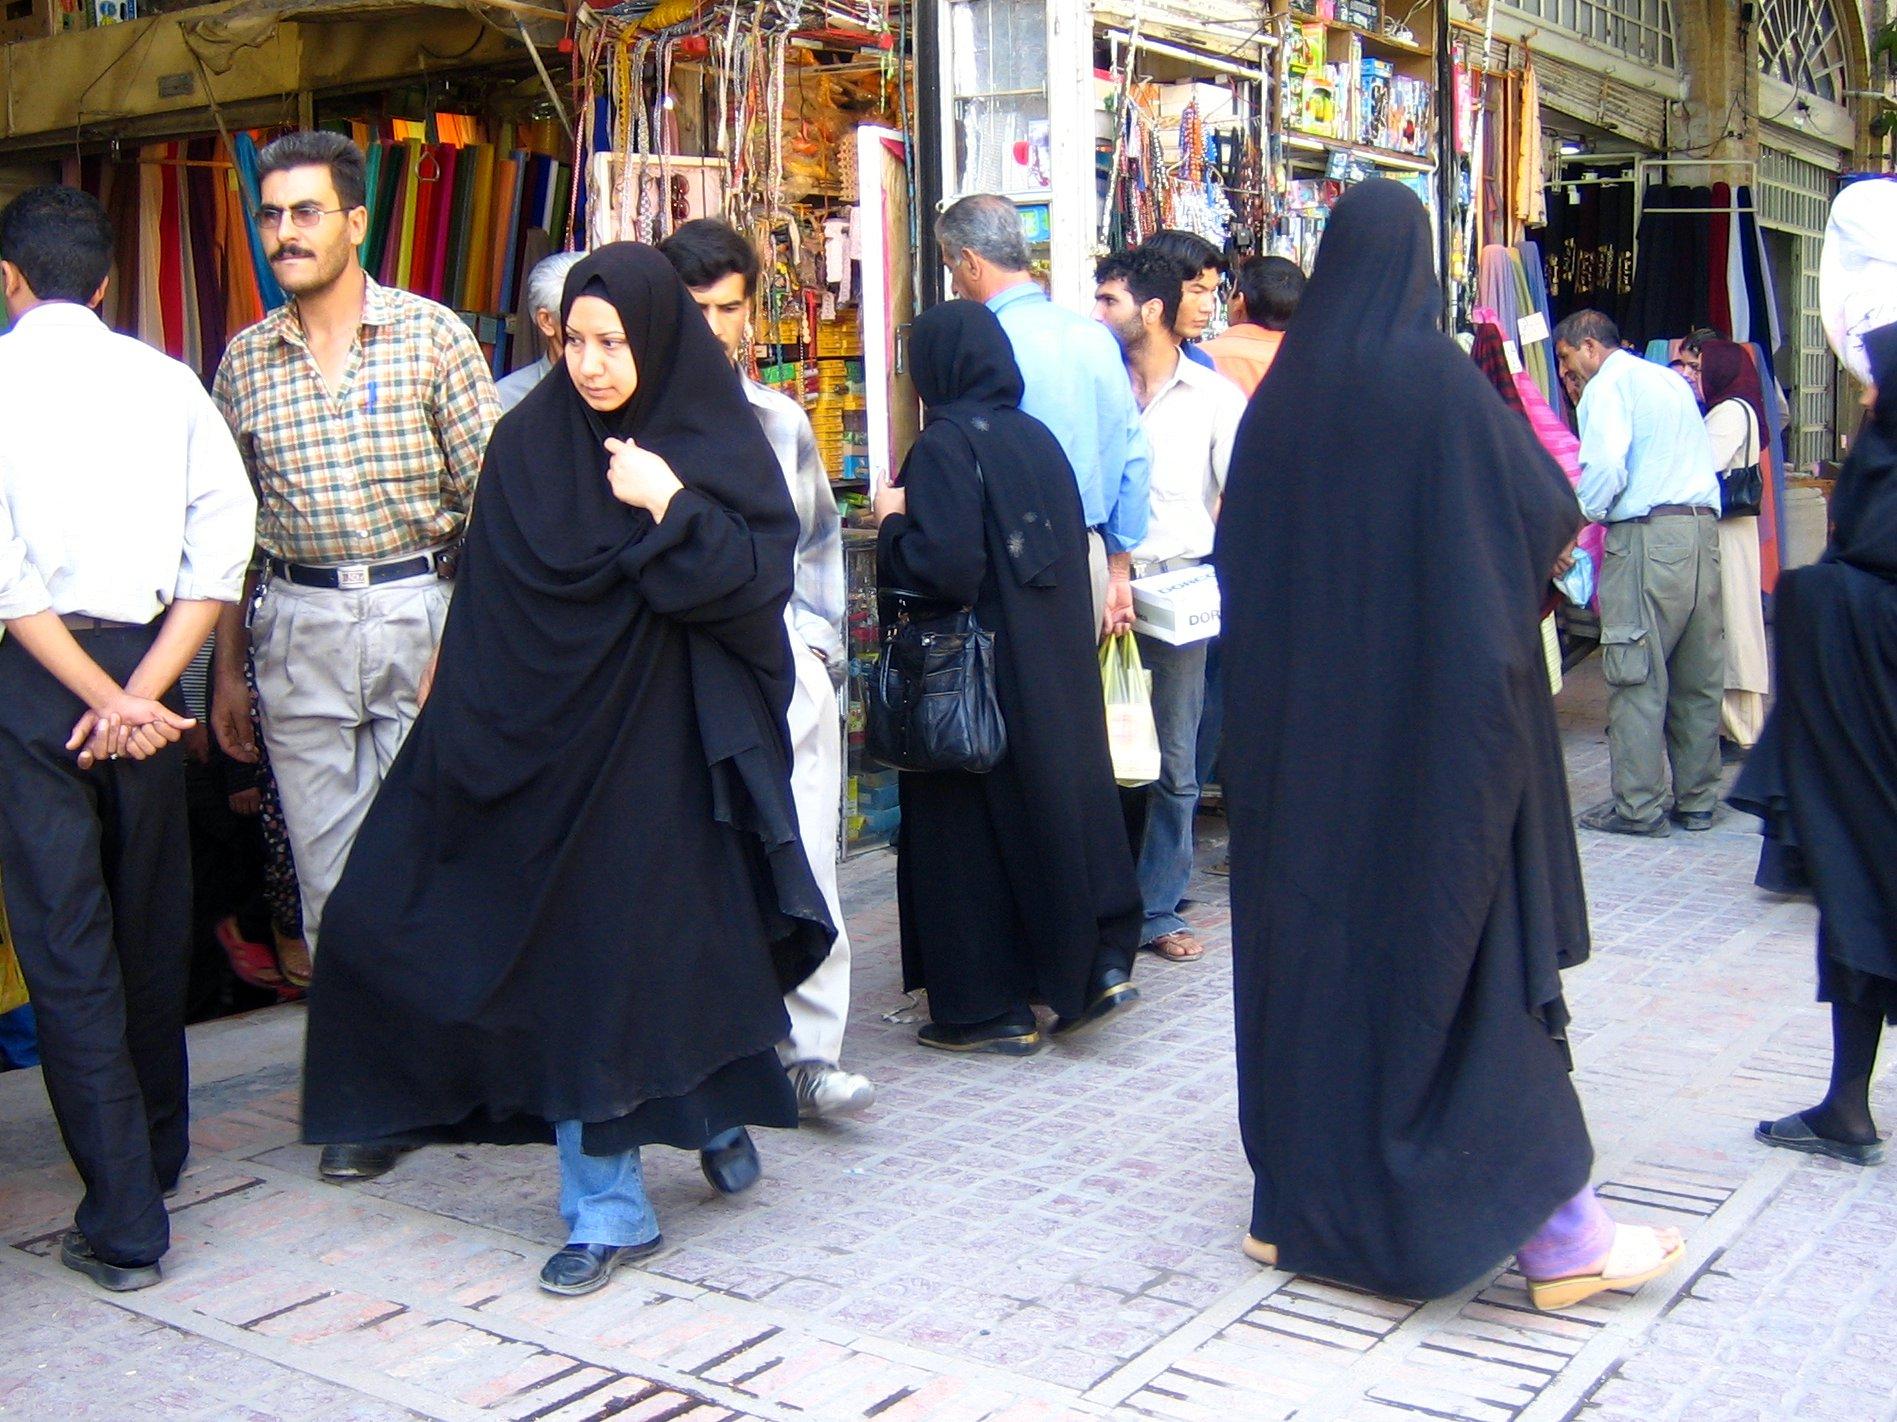 Excellent Taliban Women Dress Code  Wwwgalleryhipcom  The Hippest Pics